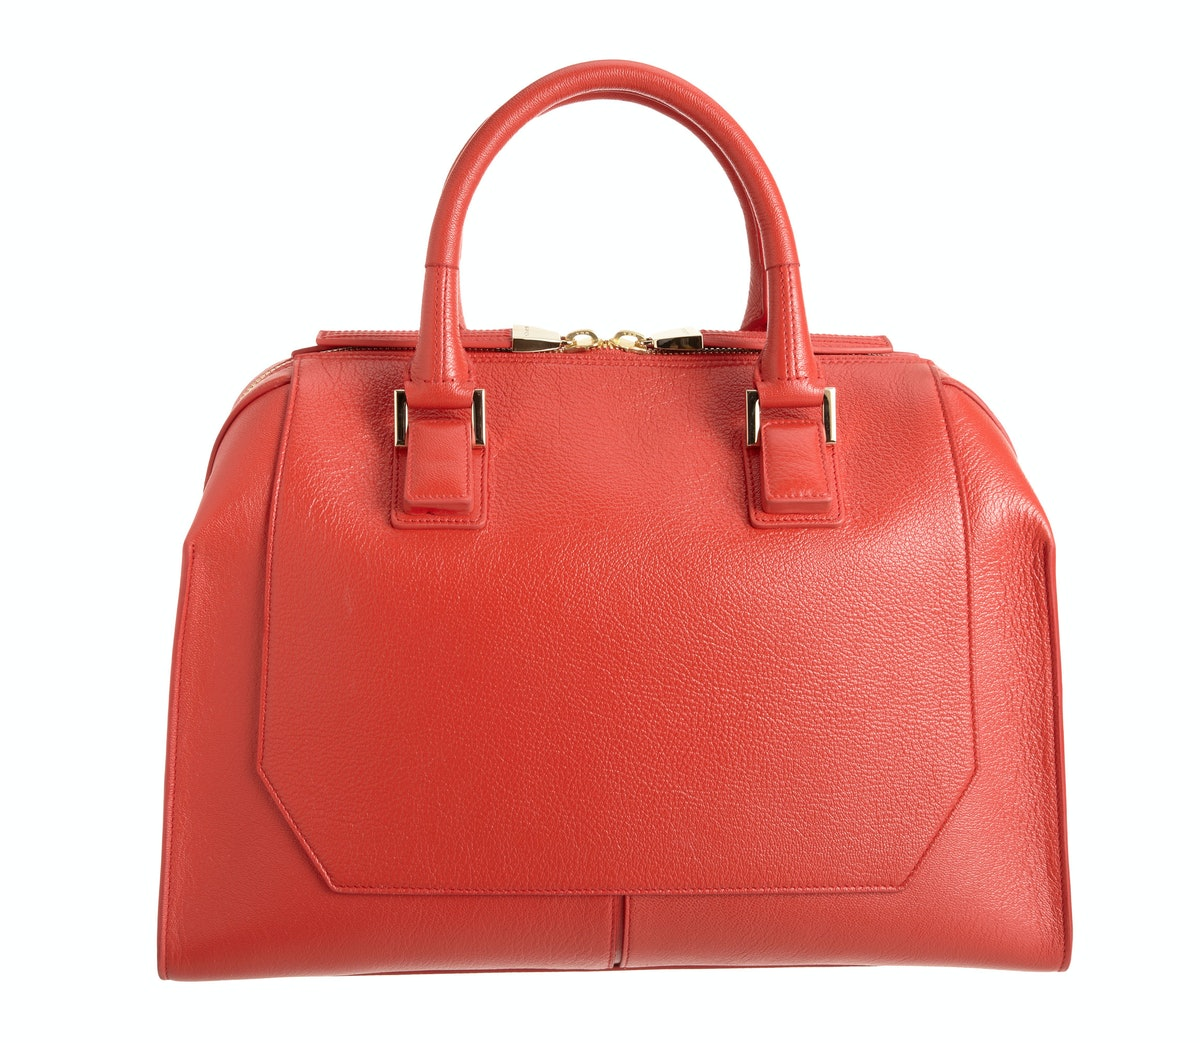 fass-bright-fall-bags-2013-10